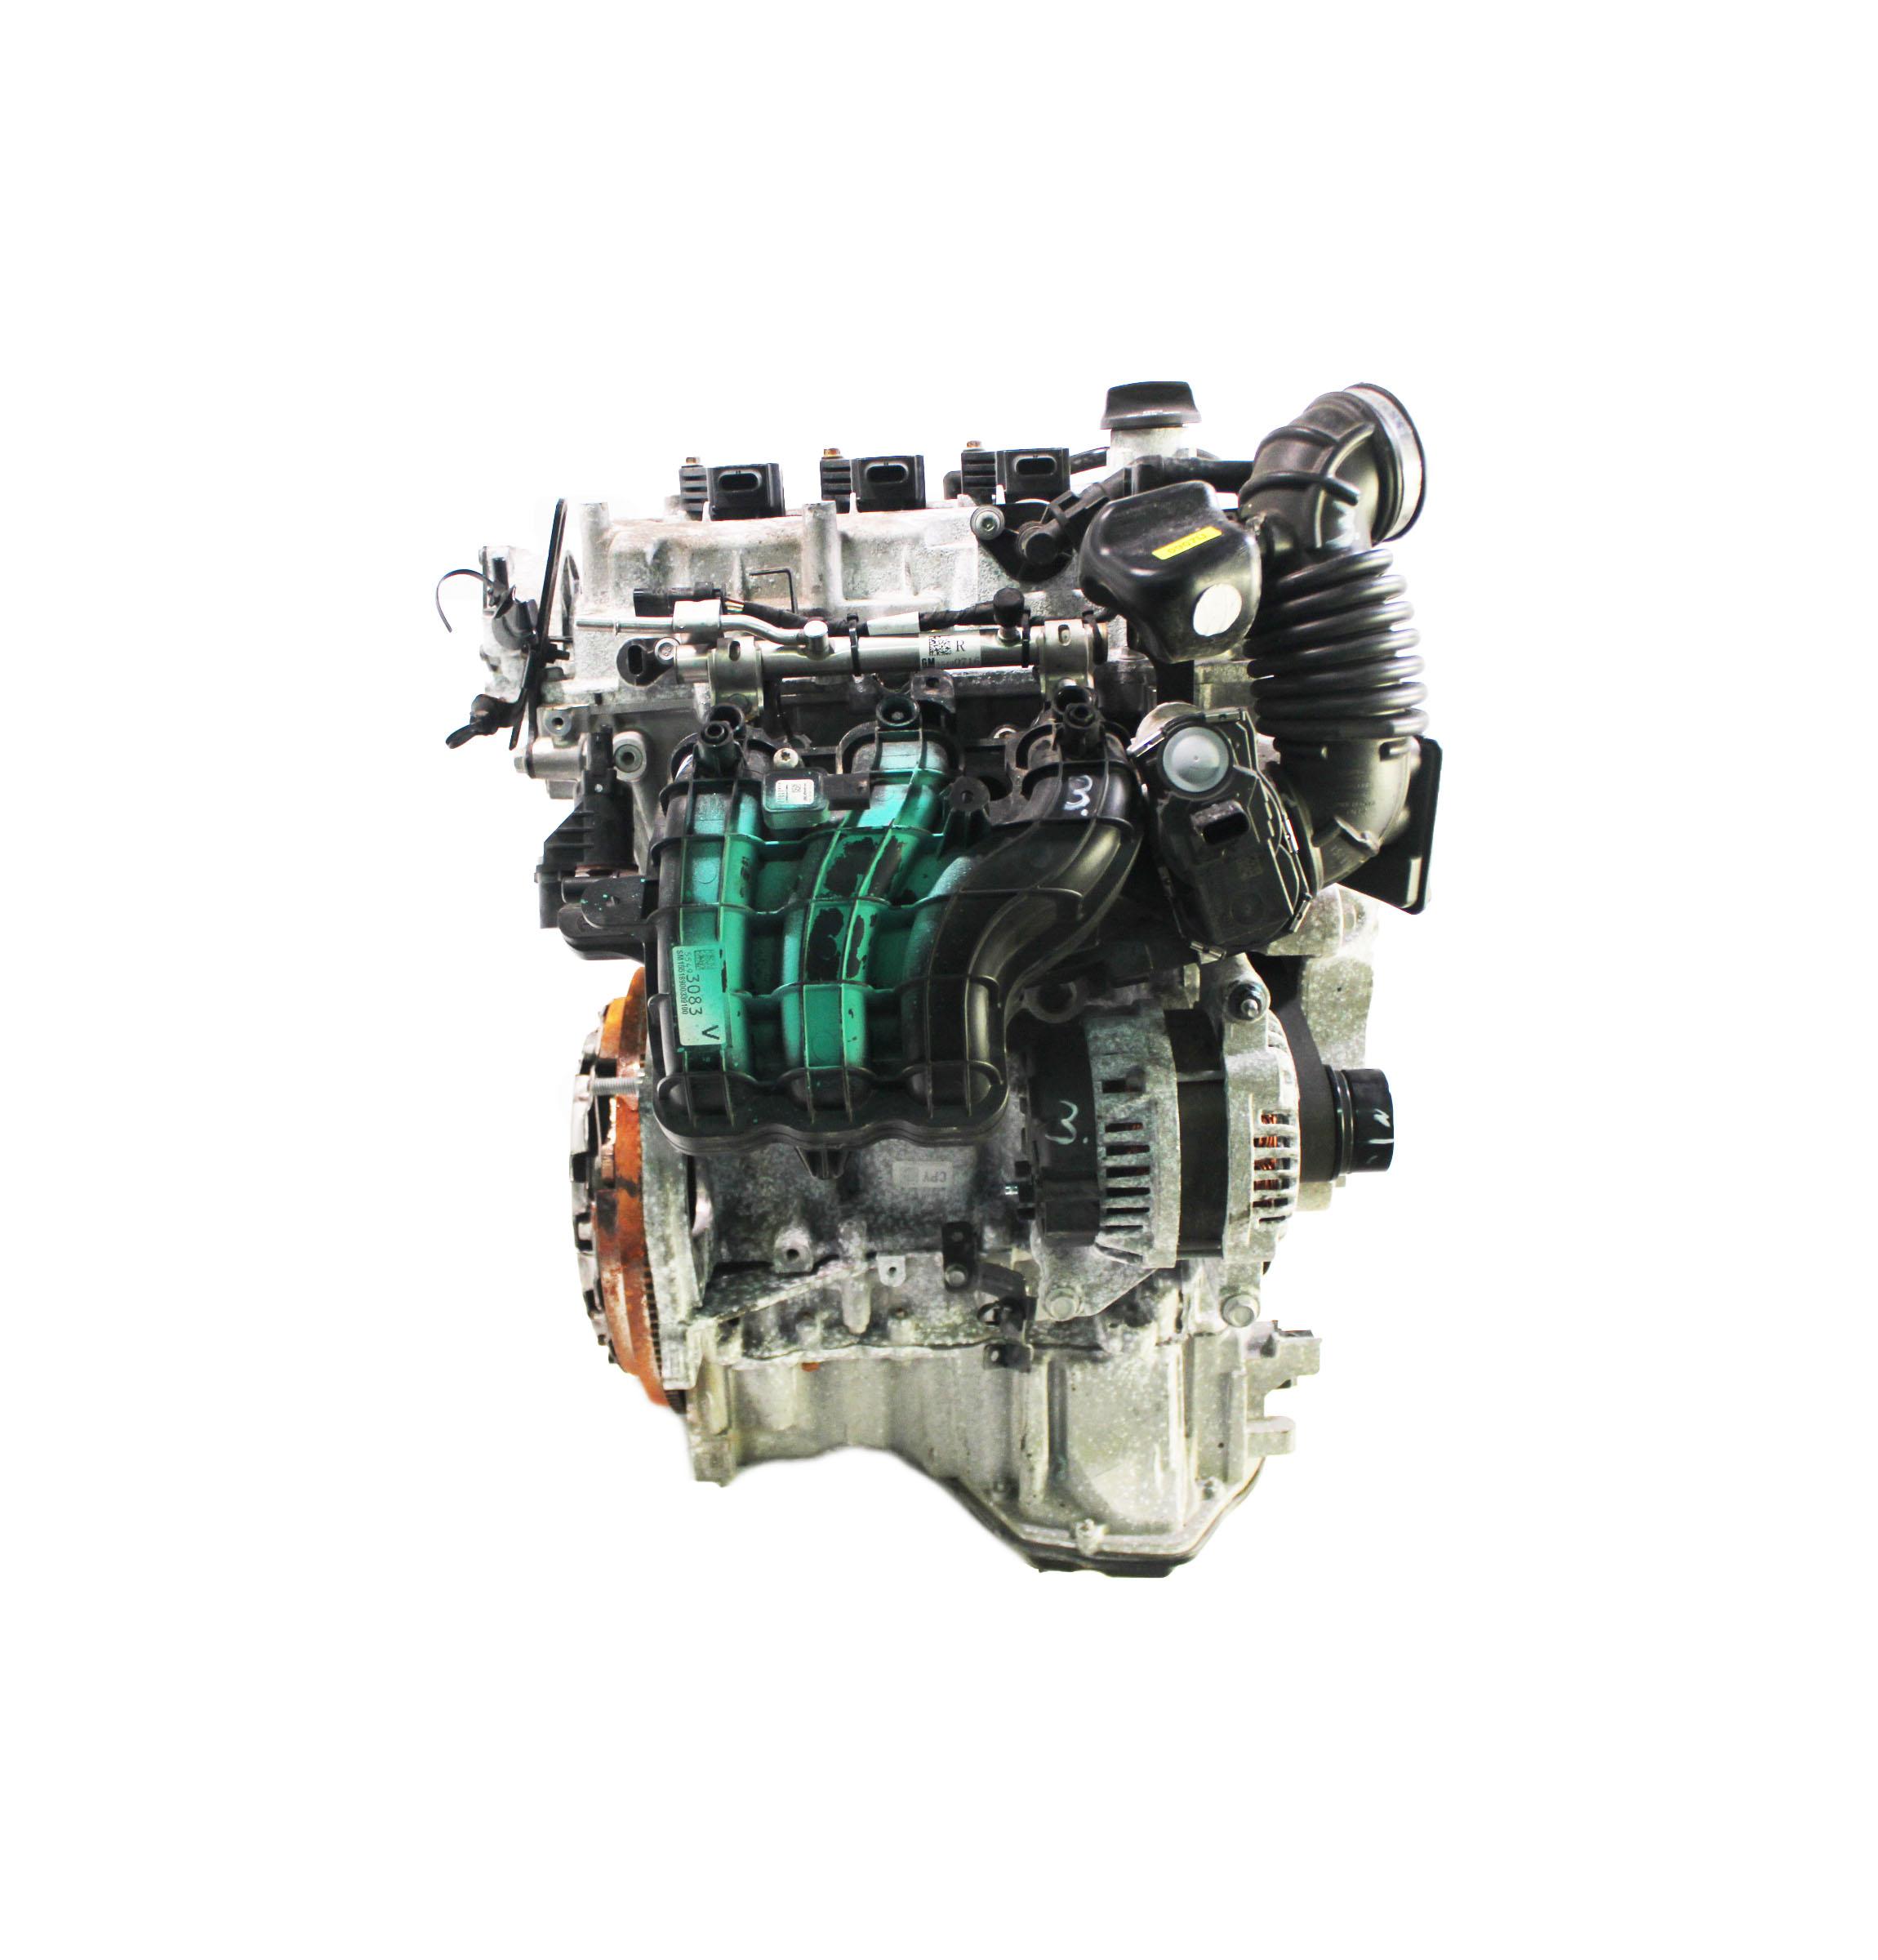 Motor für Opel Vauxhall Karl C16 Viva 1,0 Benzin L5Q B10XE 75 PS